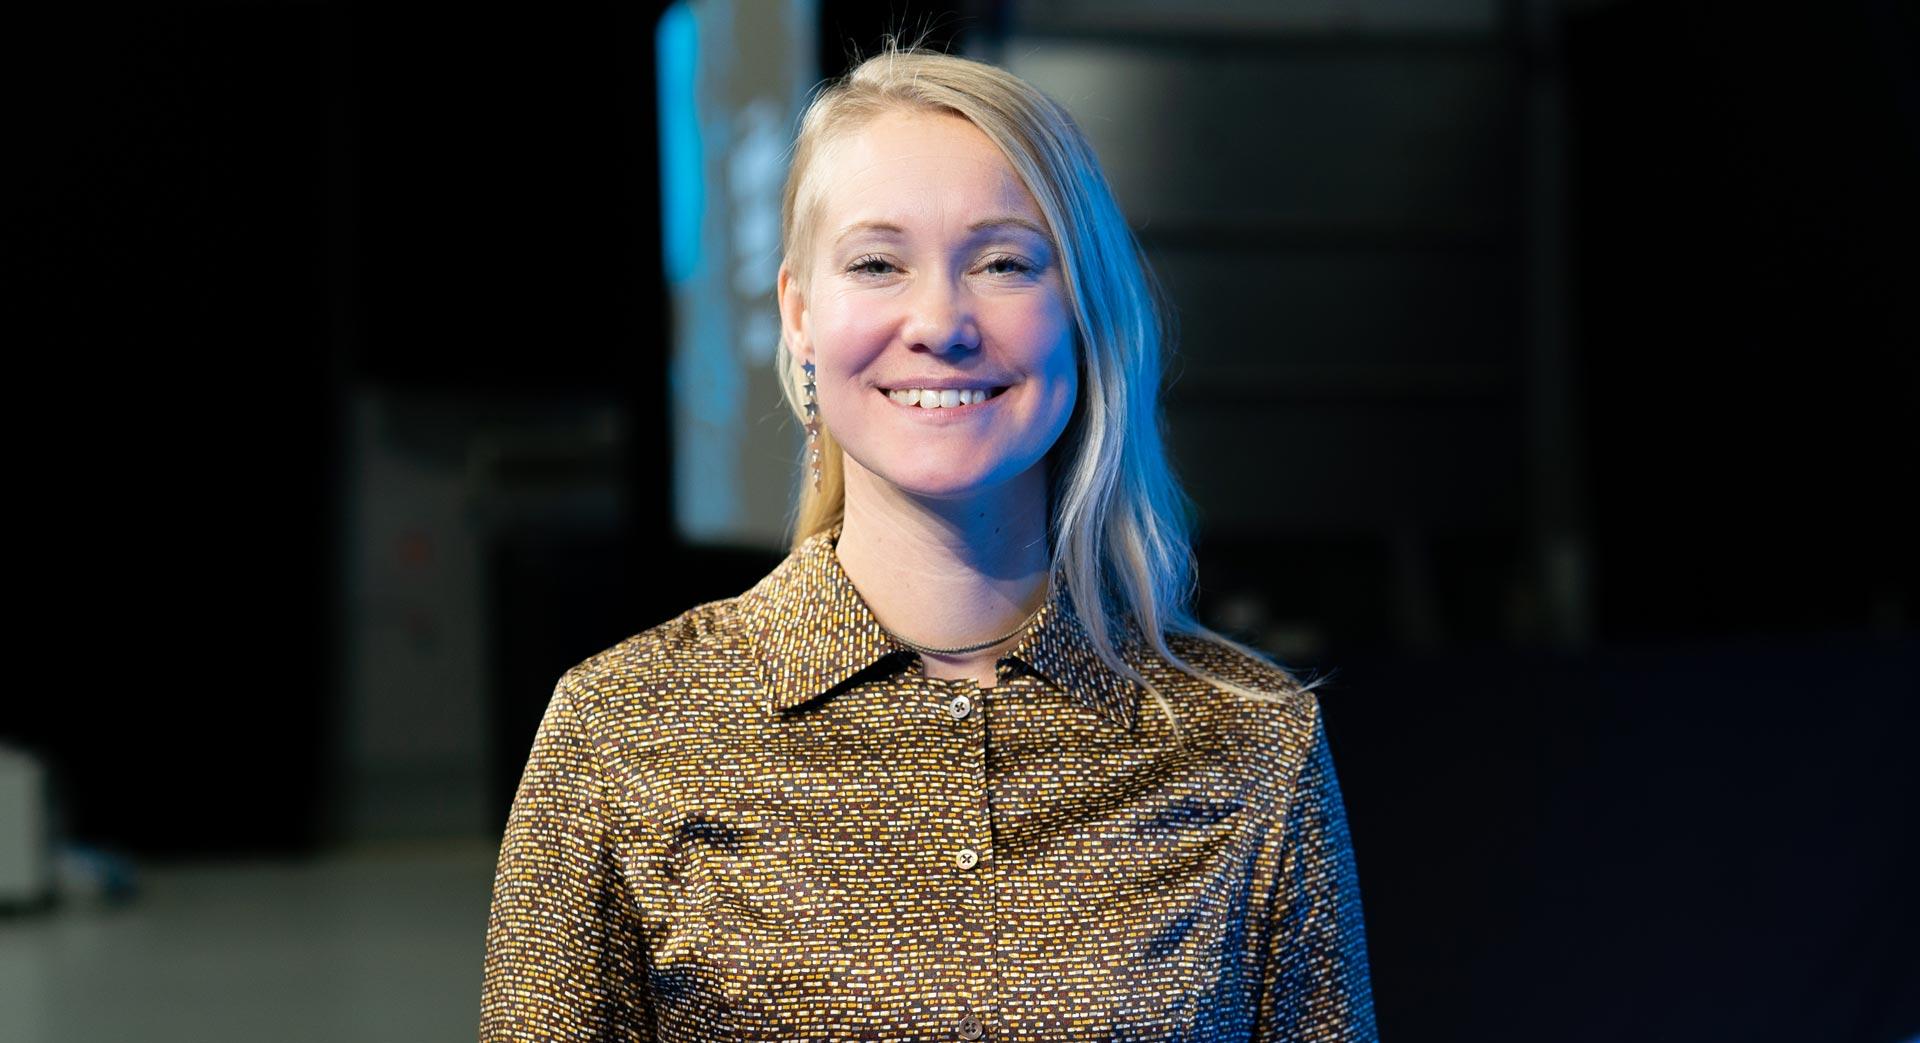 Asiakaskokemus: Emilia Lahti